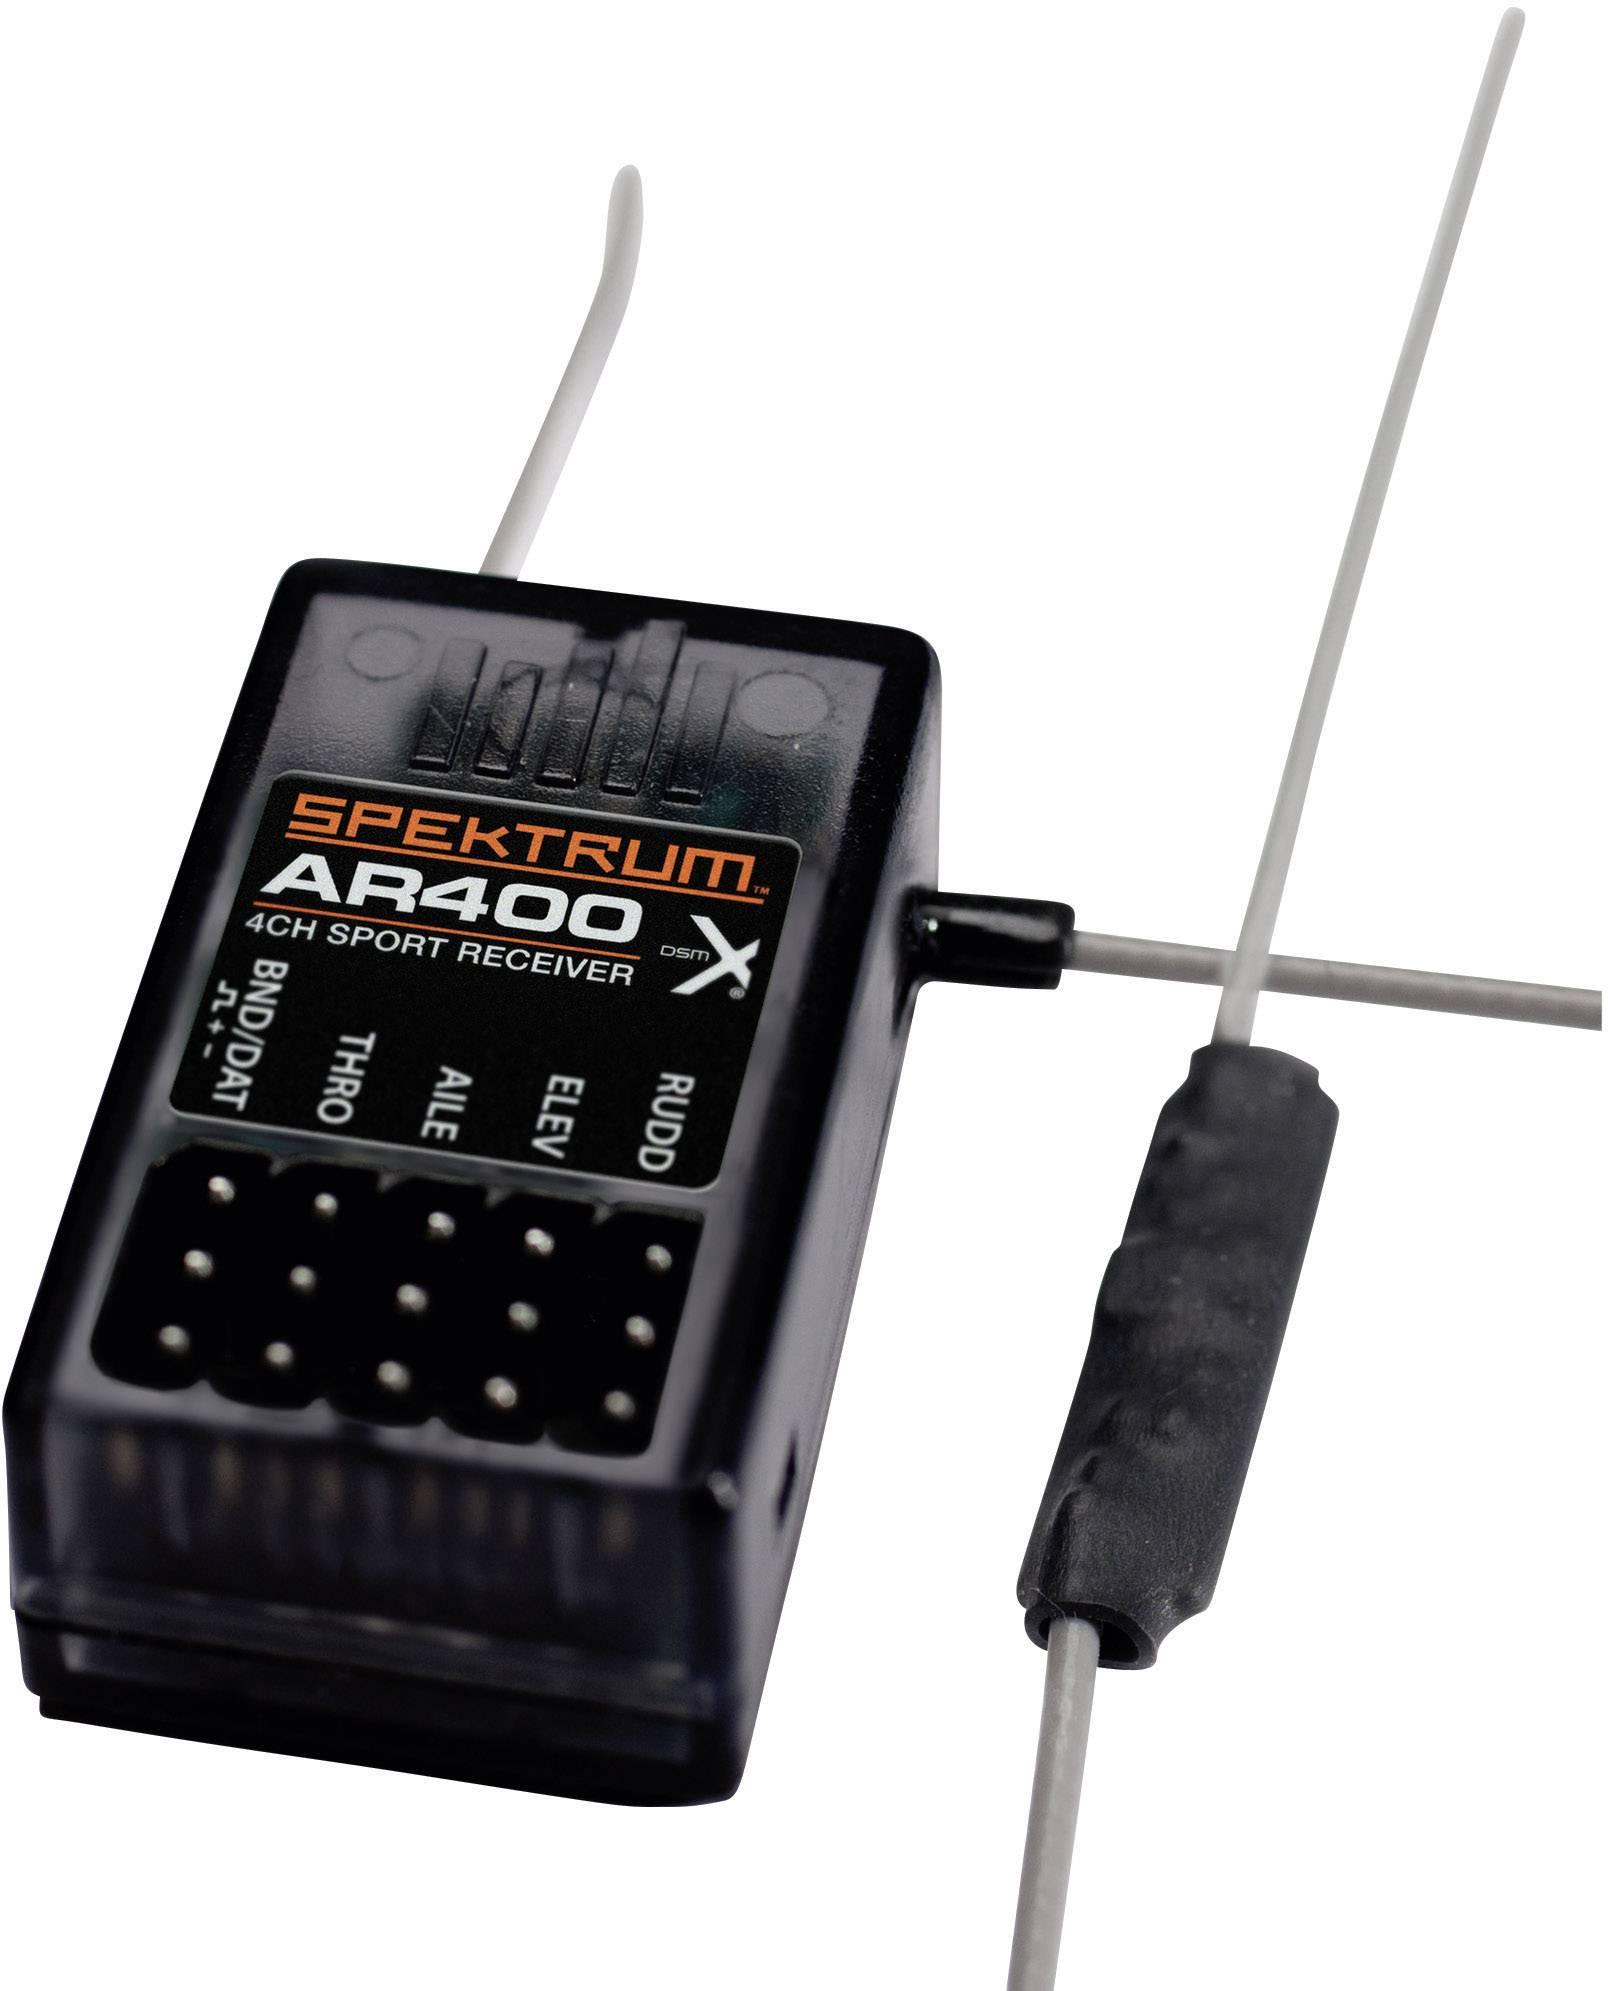 Přijímač Spektrum AR400 DSM X, 2,4 GHz, 4 kanály, JR